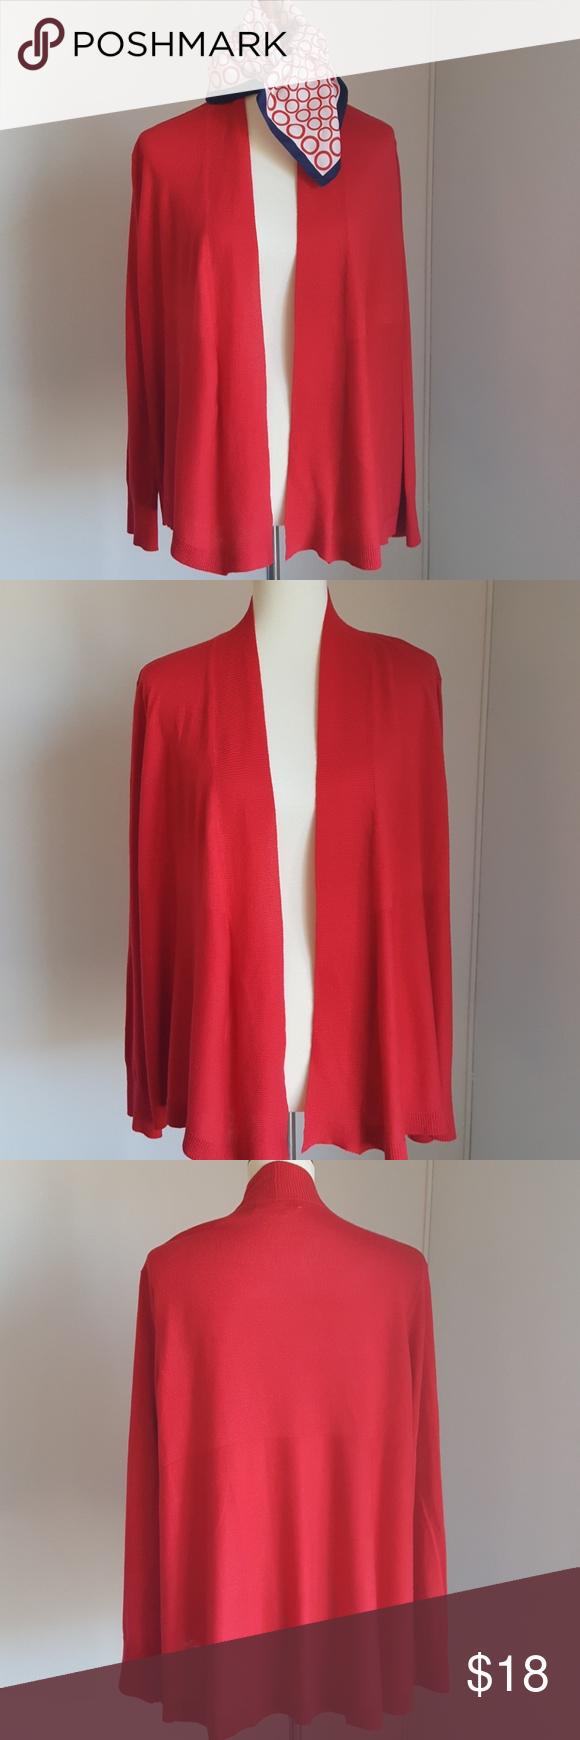 Lovely Red Shrug by Elizabeth Claiborne Extra large. Elizabeth Claiborne Sweaters Shrugs & Ponchos